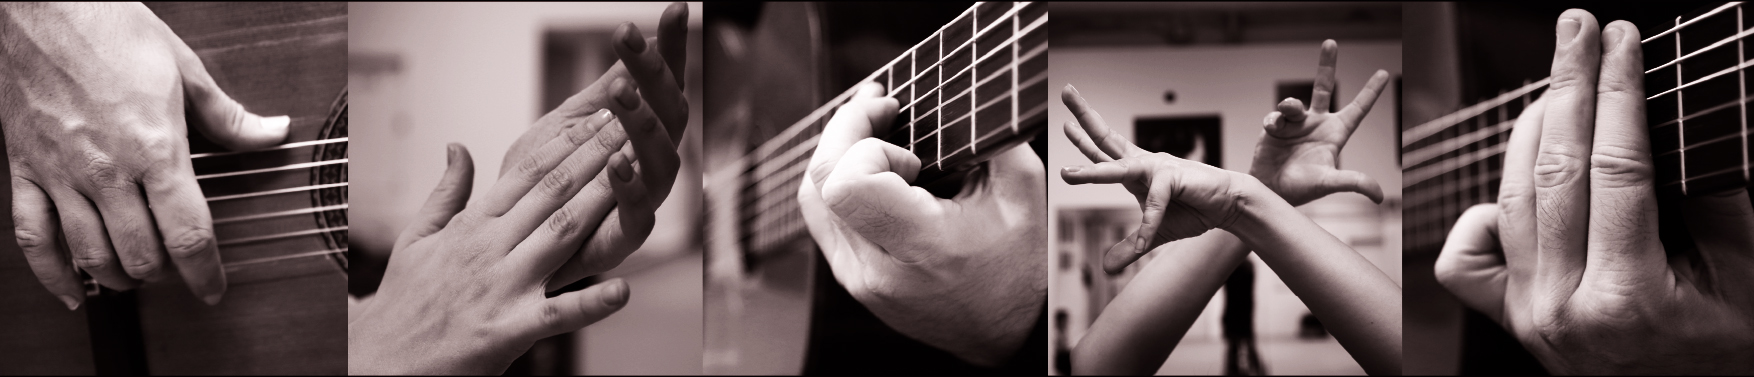 Arteflamenco-kitarrimäng